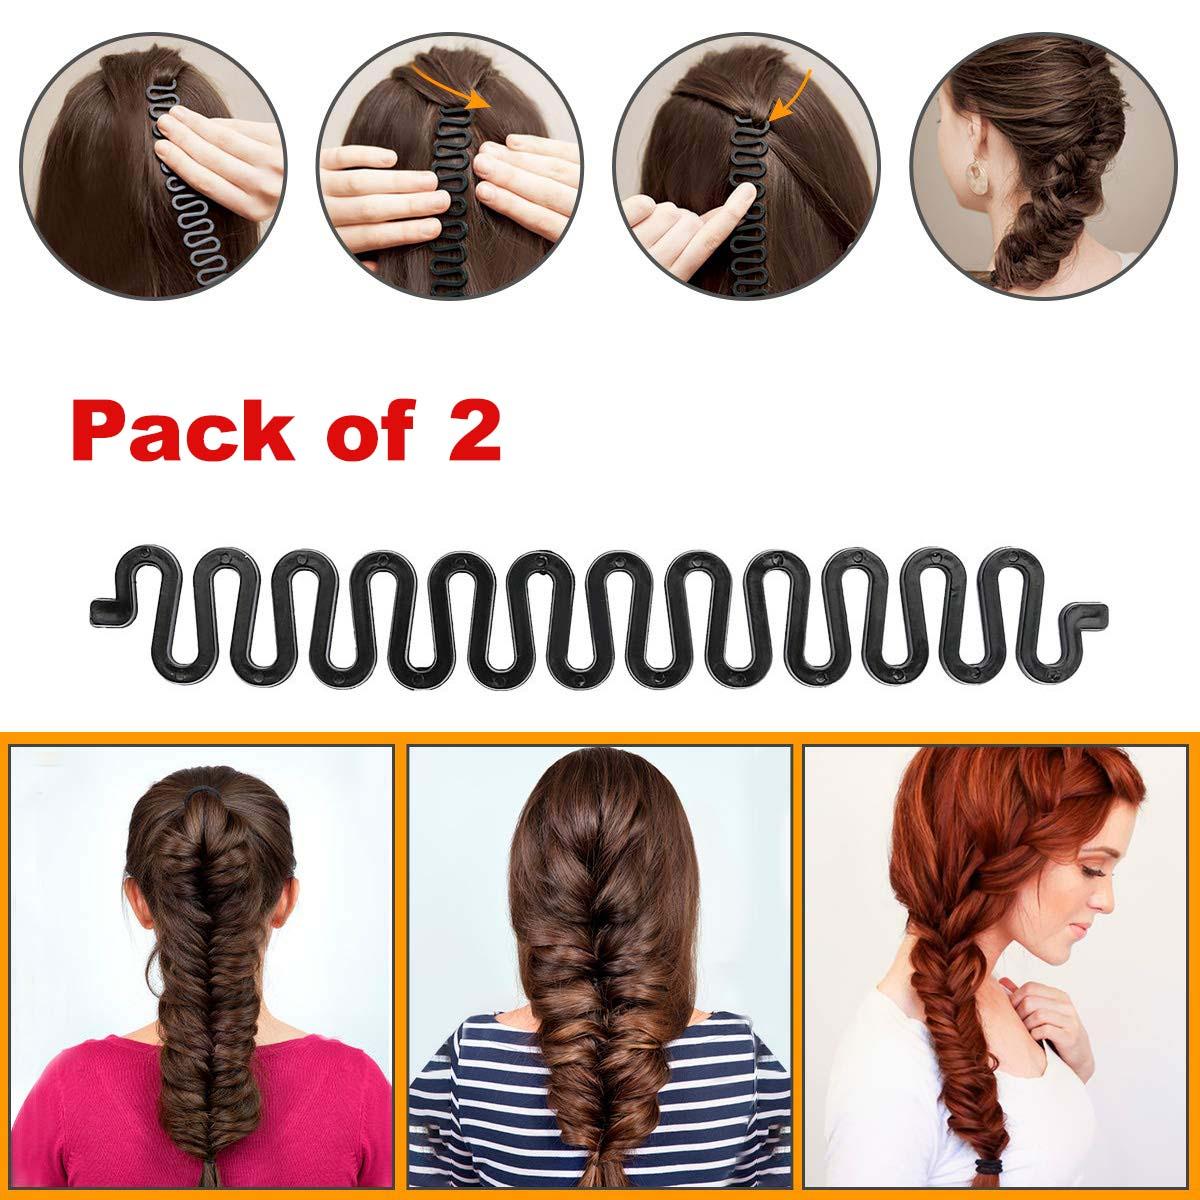 2pc Fashion Style Ponytail Curly Hair Braider DIY Twist Twister Braid Tool Magic French Hair Holder Clip Stick